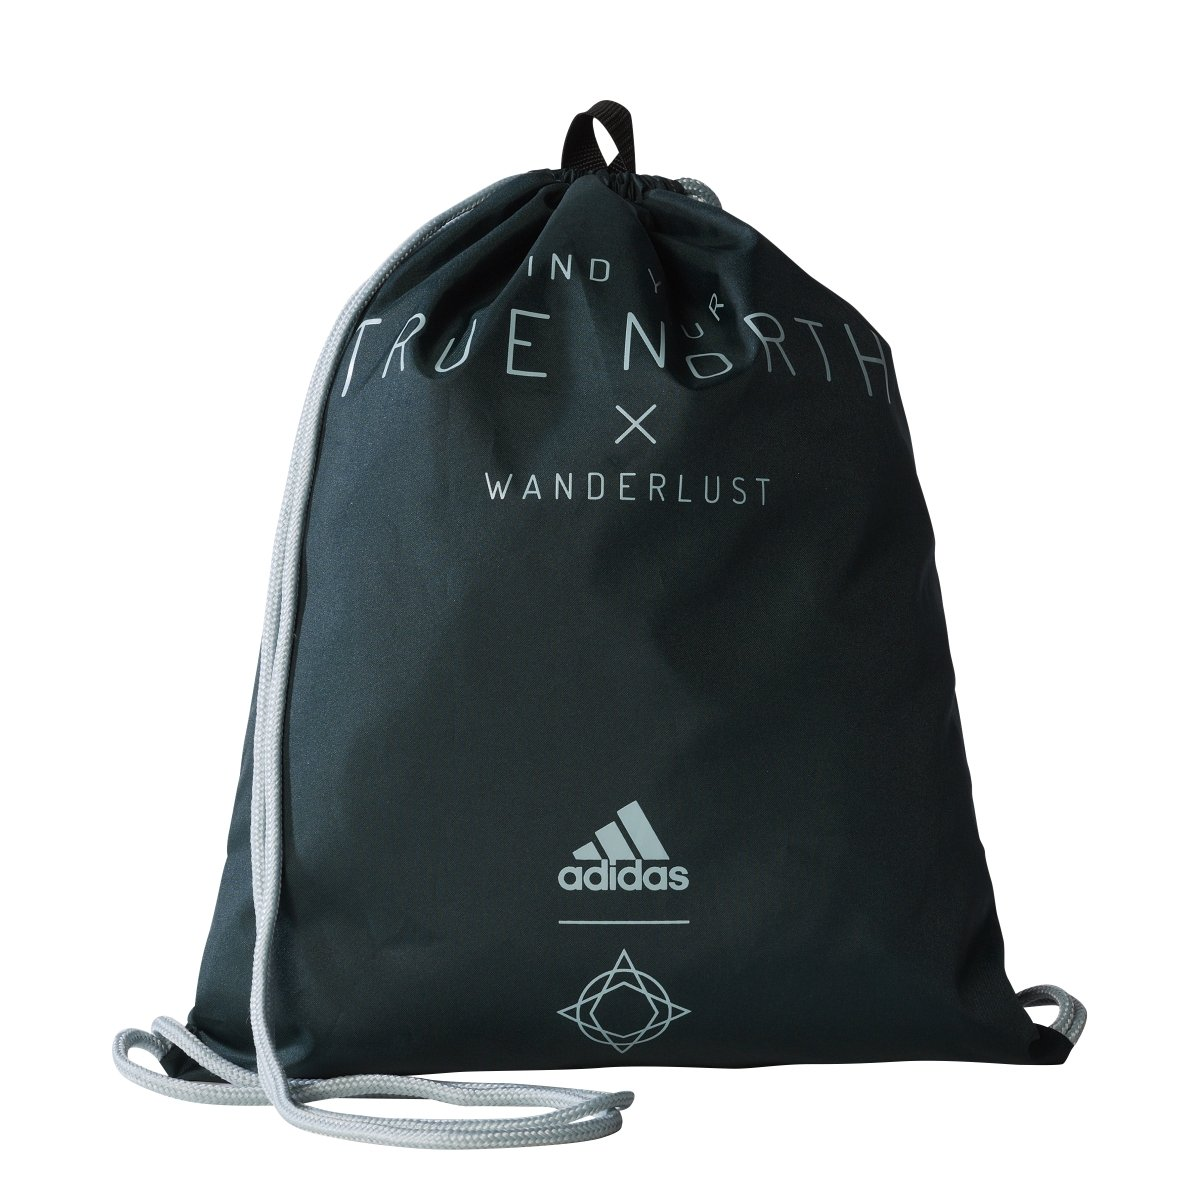 bcd943a3eb Amazon.com: adidas Wanderlust Gym Sack: Sports & Outdoors